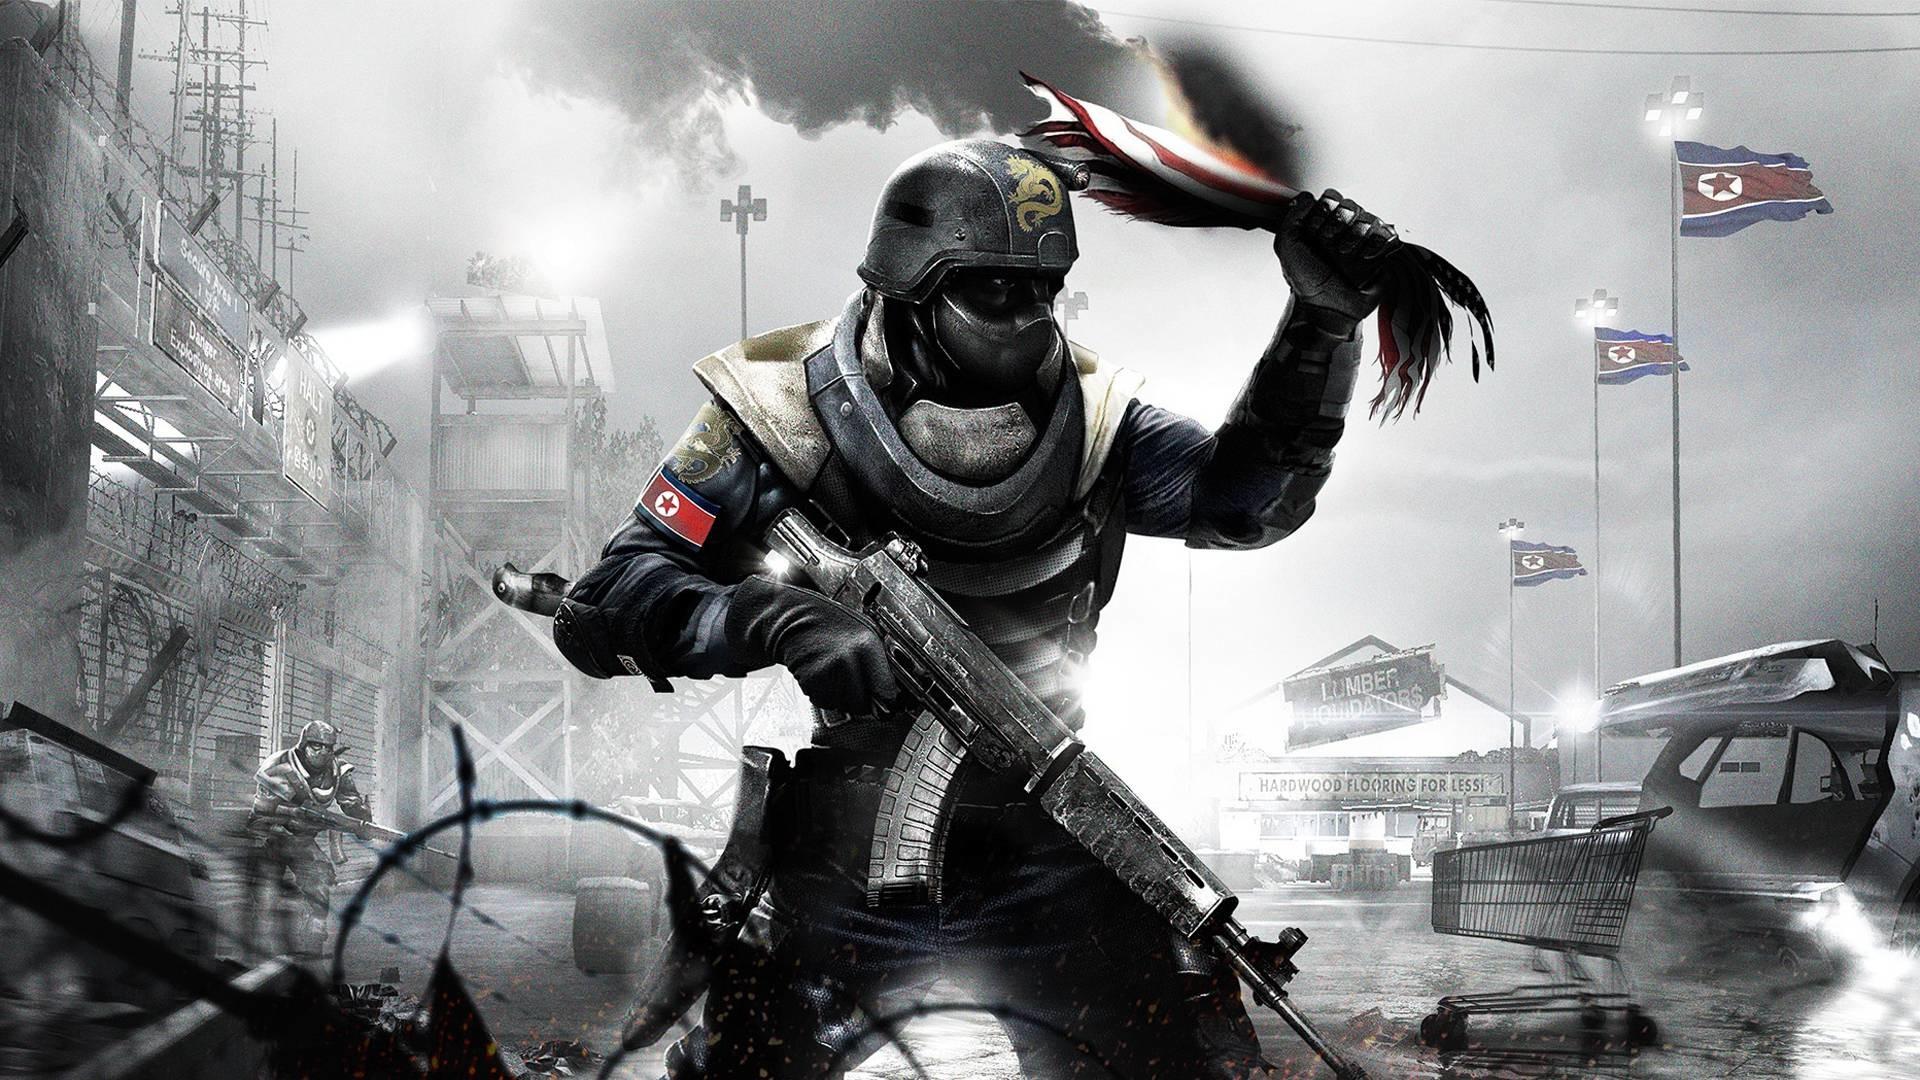 video game wallpaper 1080p